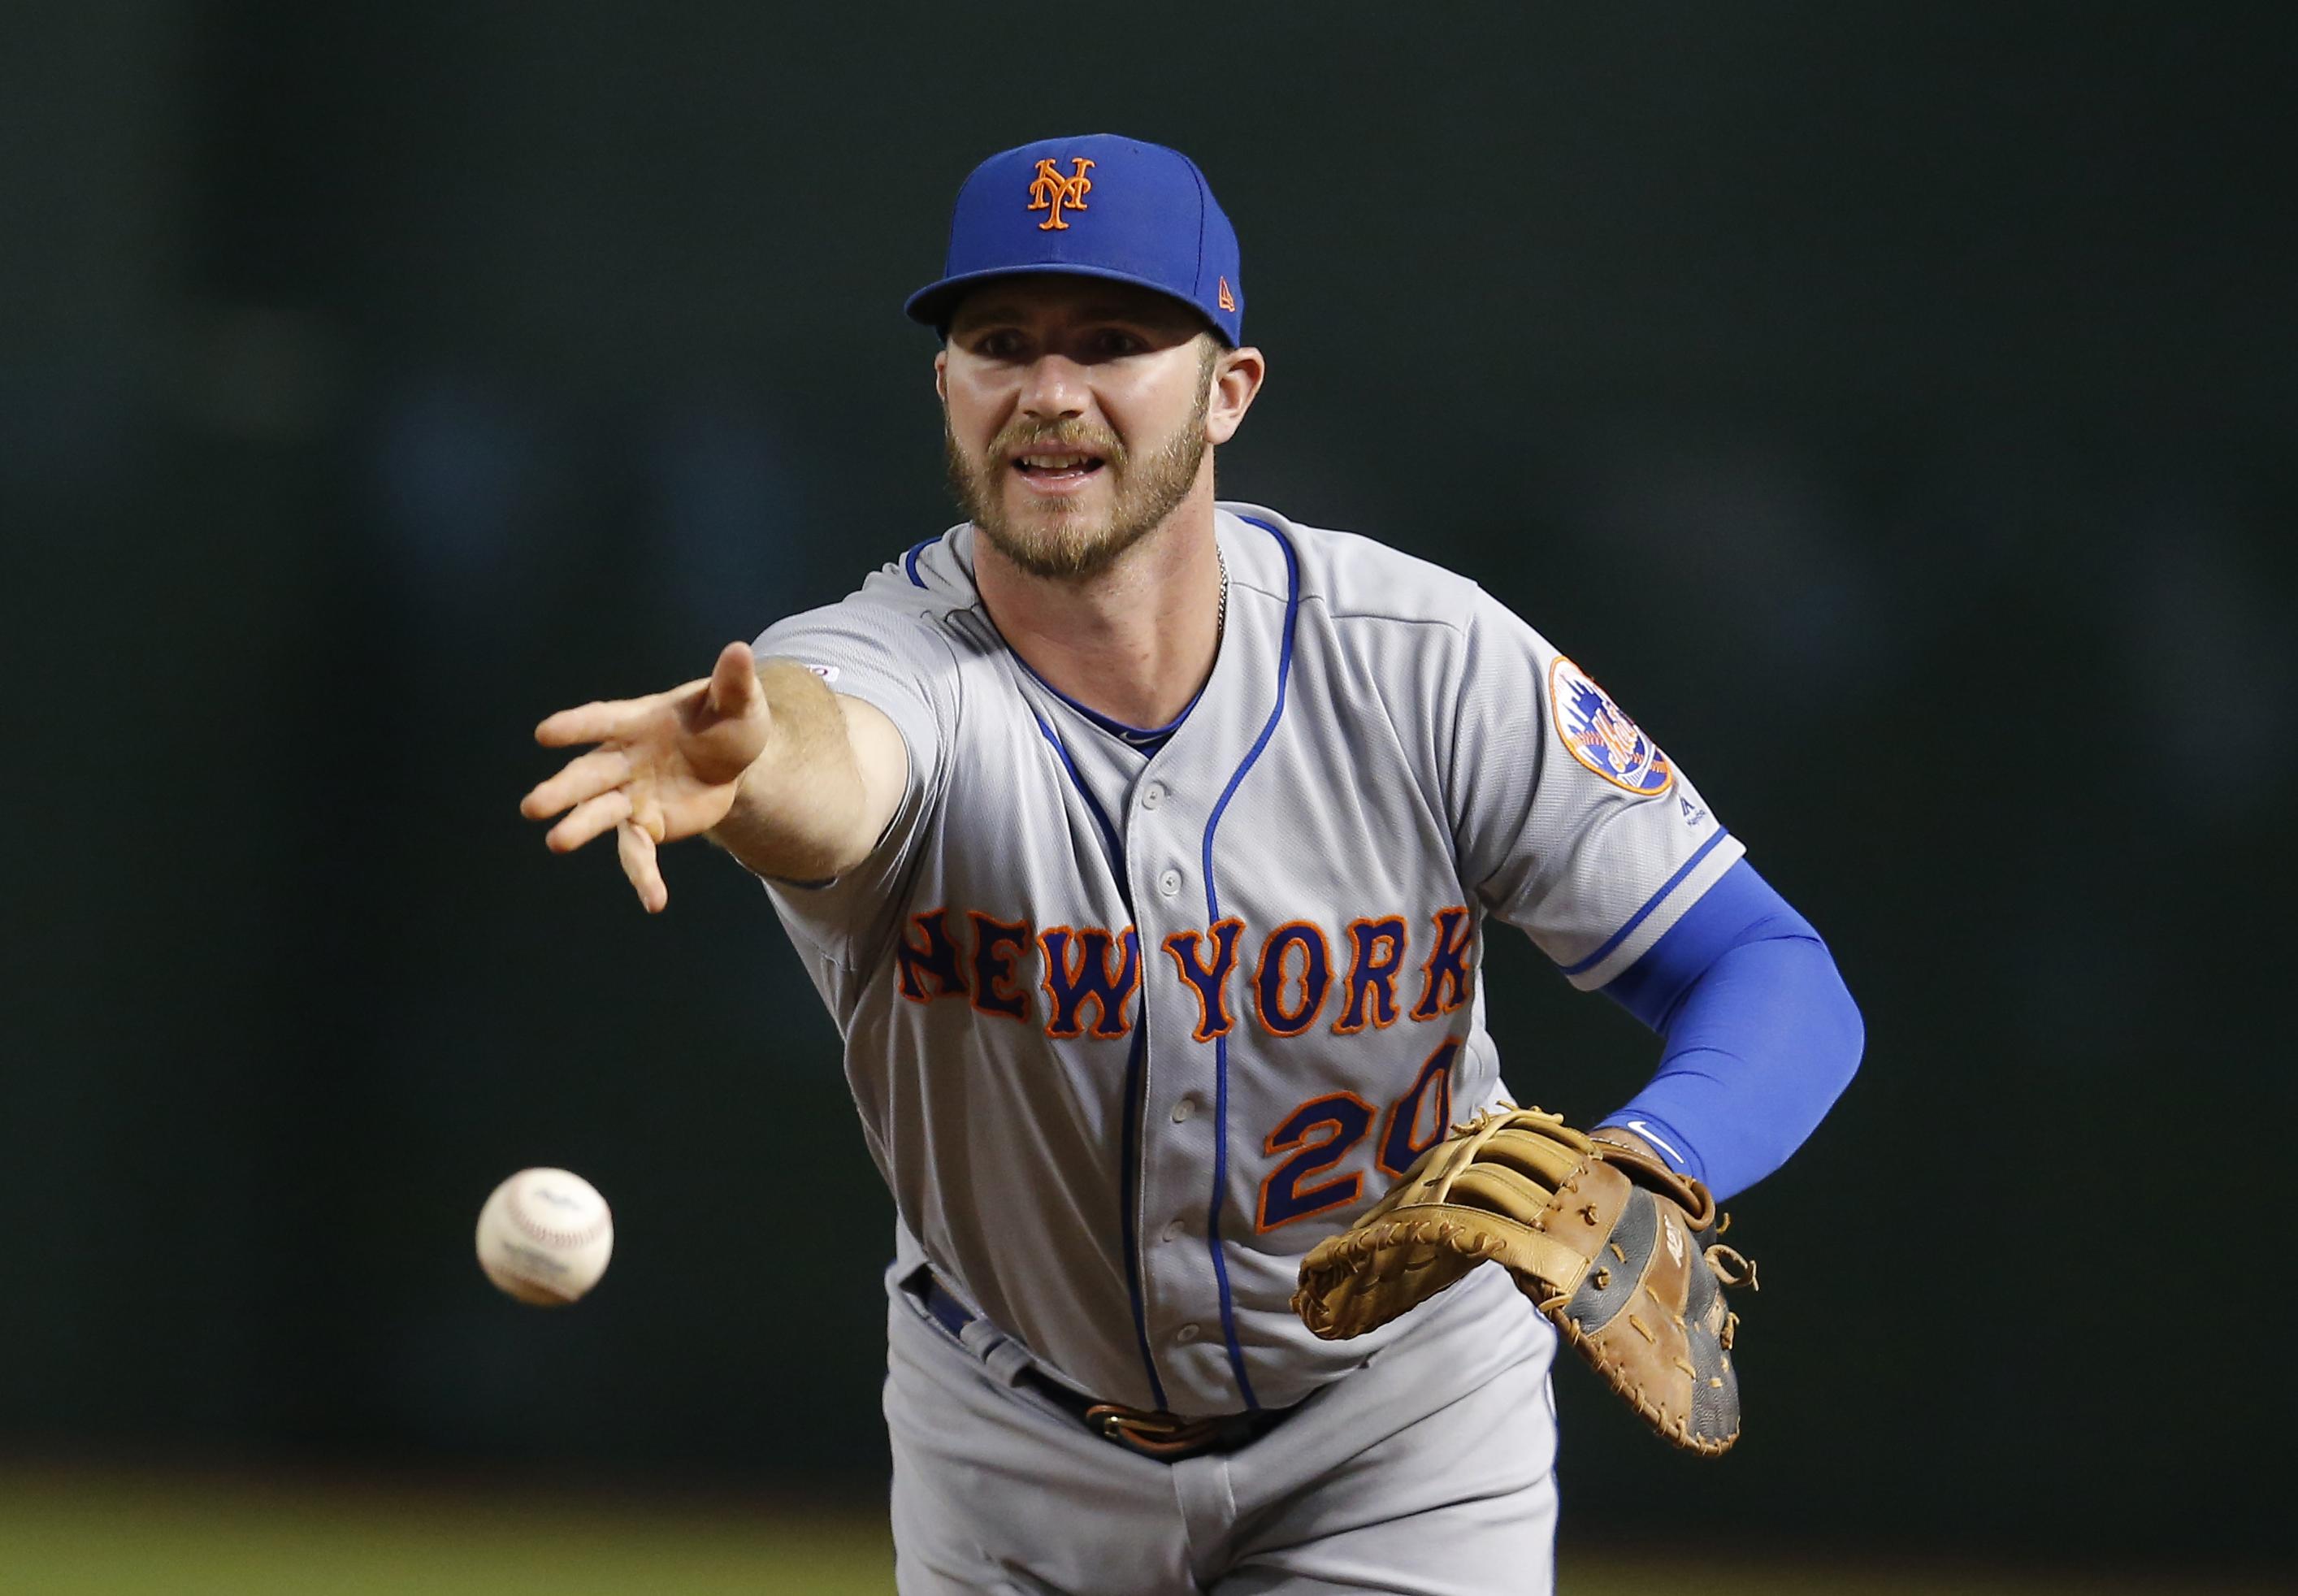 6/2/19 Game Preview: New York Mets at Arizona Diamondbacks